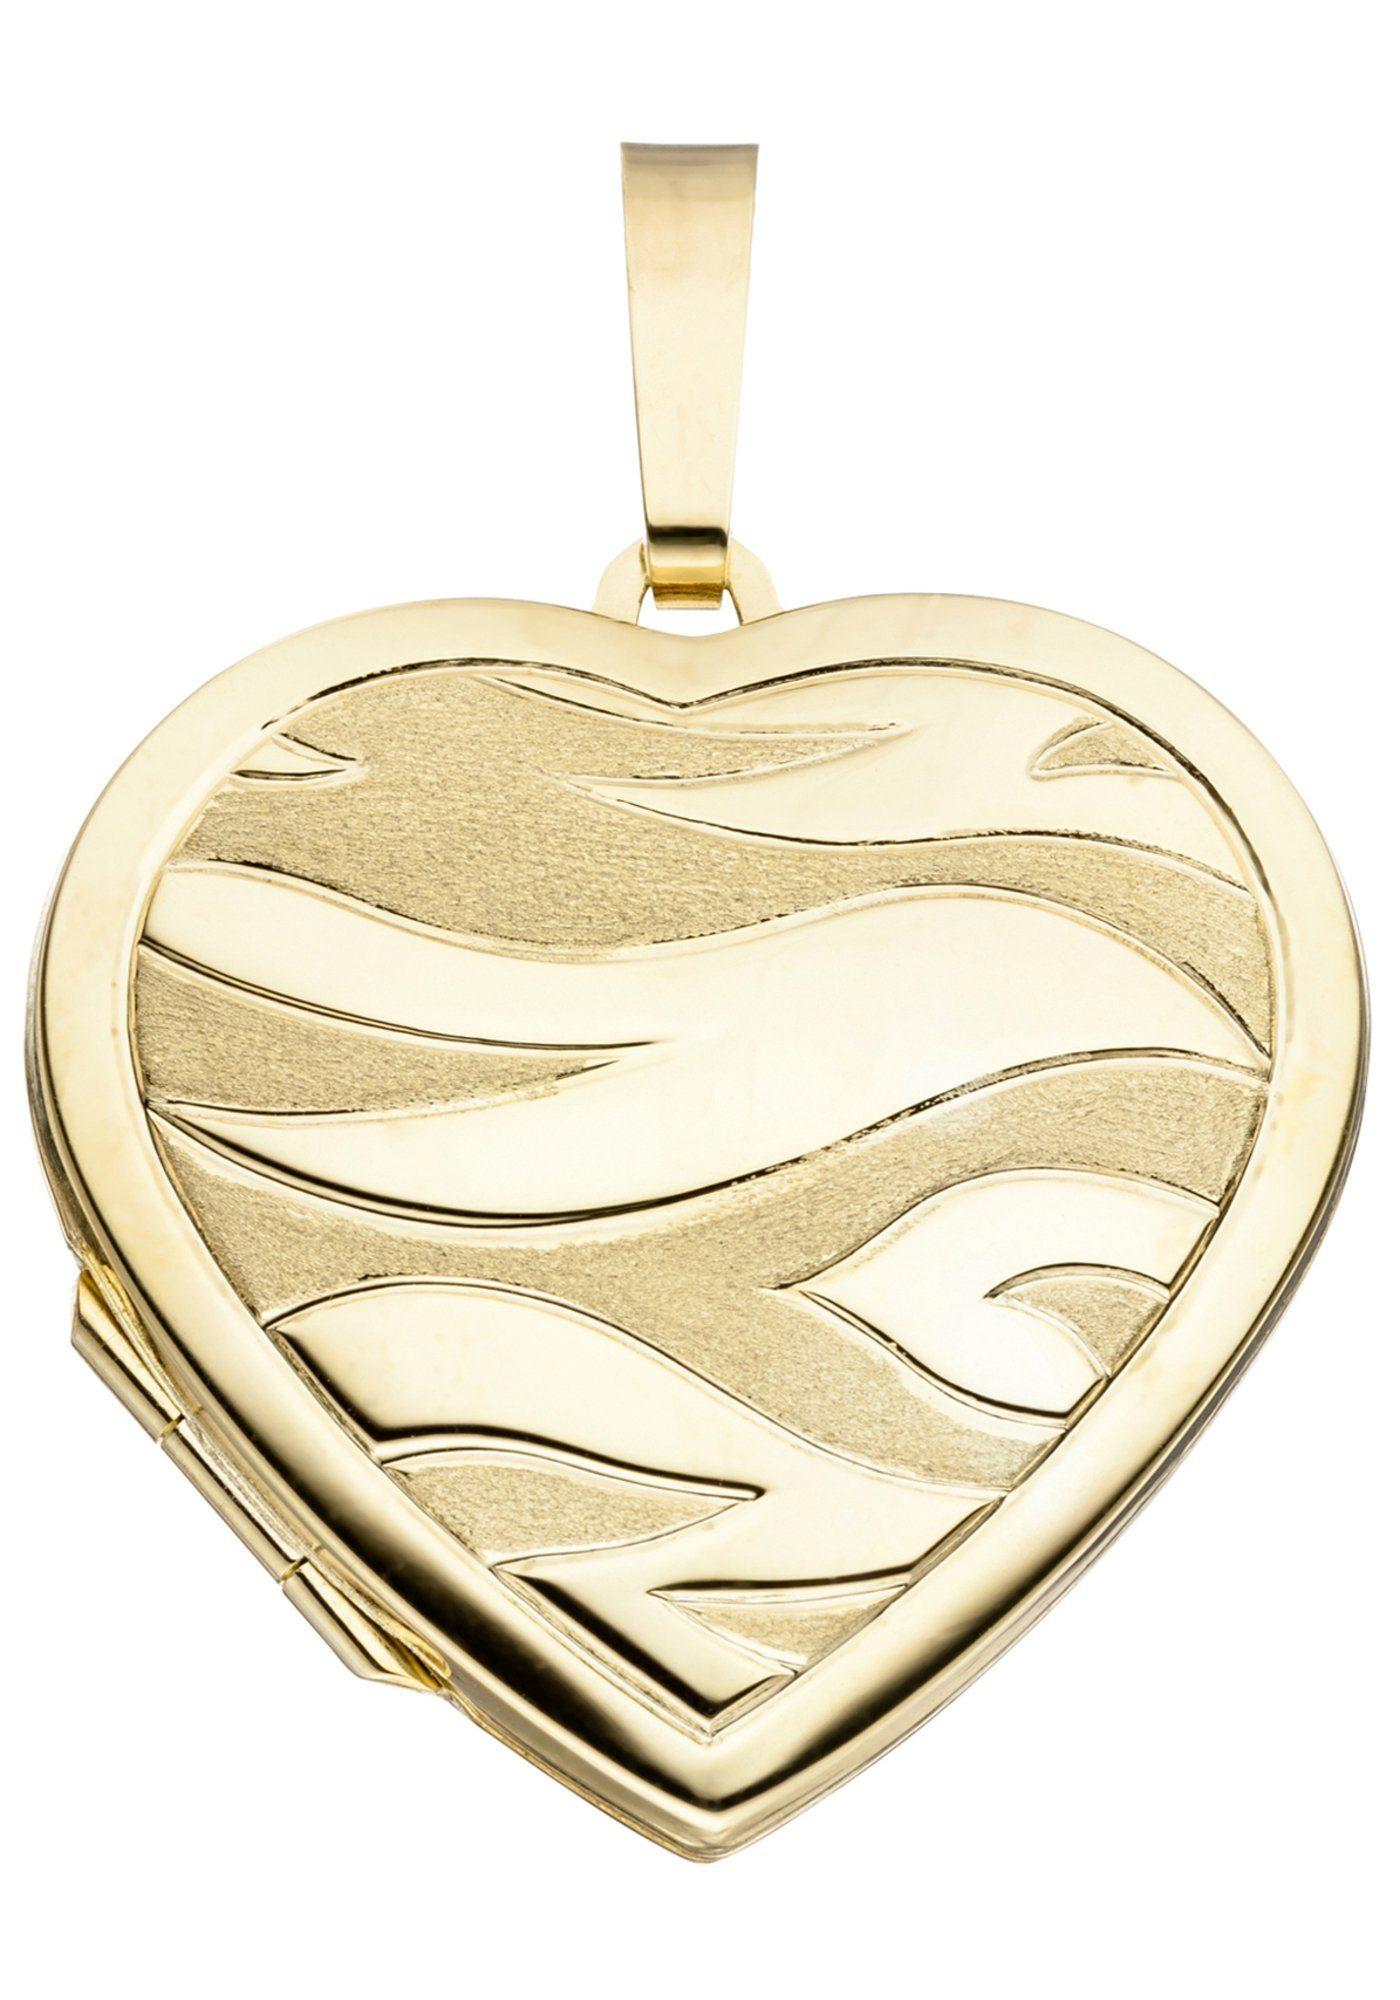 JOBO Medallionanhänger Herz 585 Gold